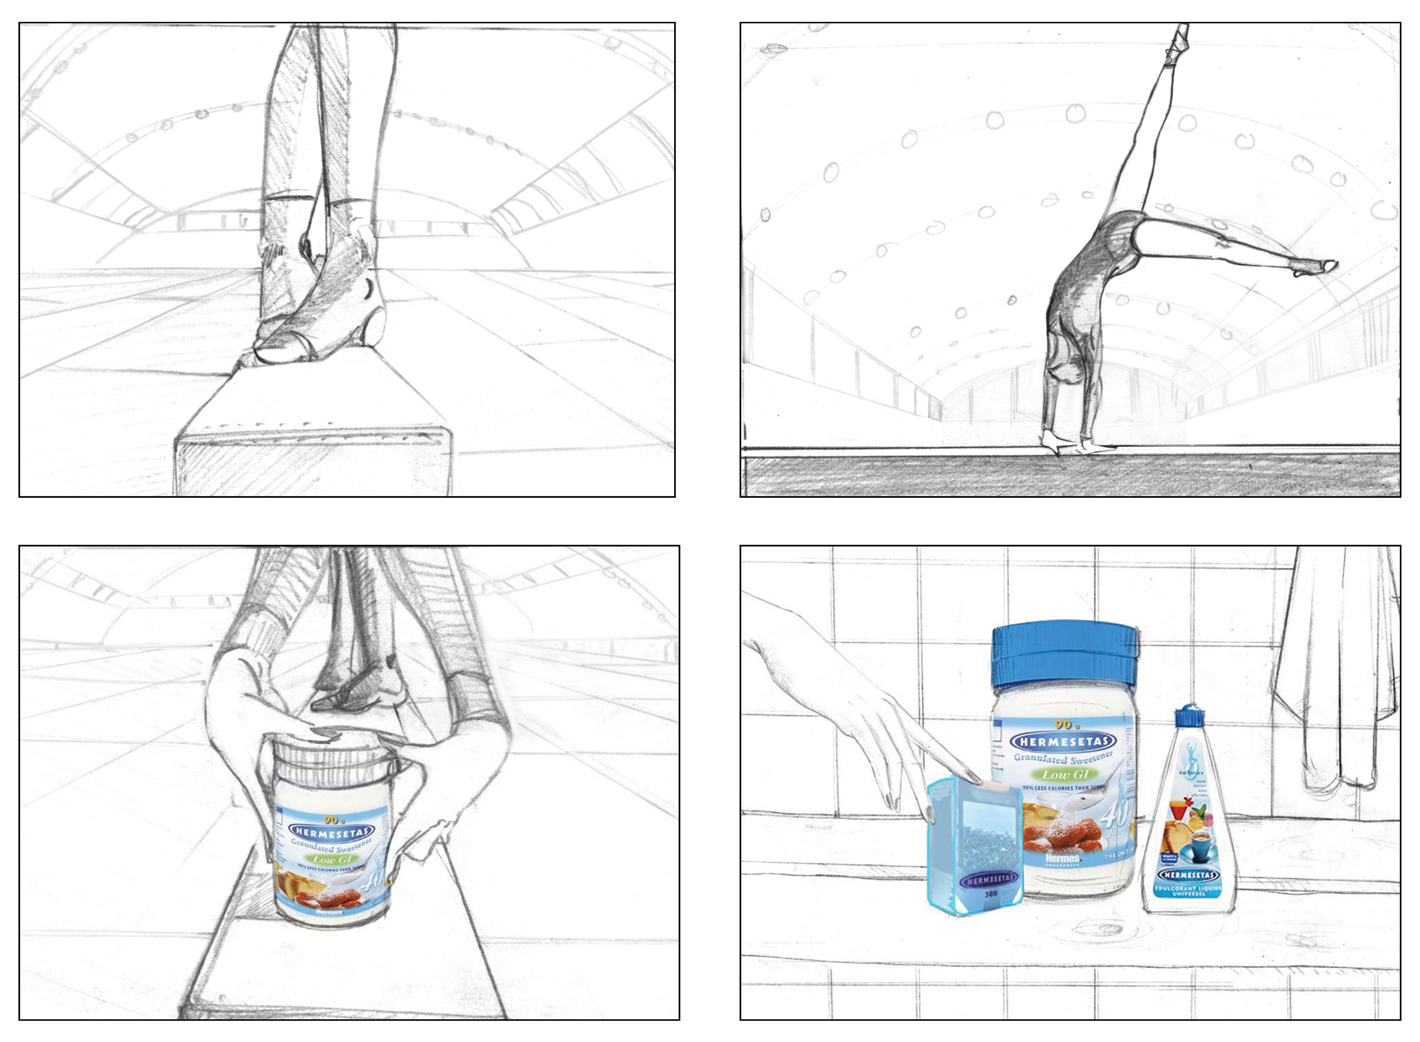 Hermesetas2.rough.nyan.pereira.dessinateur.illustration.storyboard.Sucre.femme.courire.agence.equilibre.sante